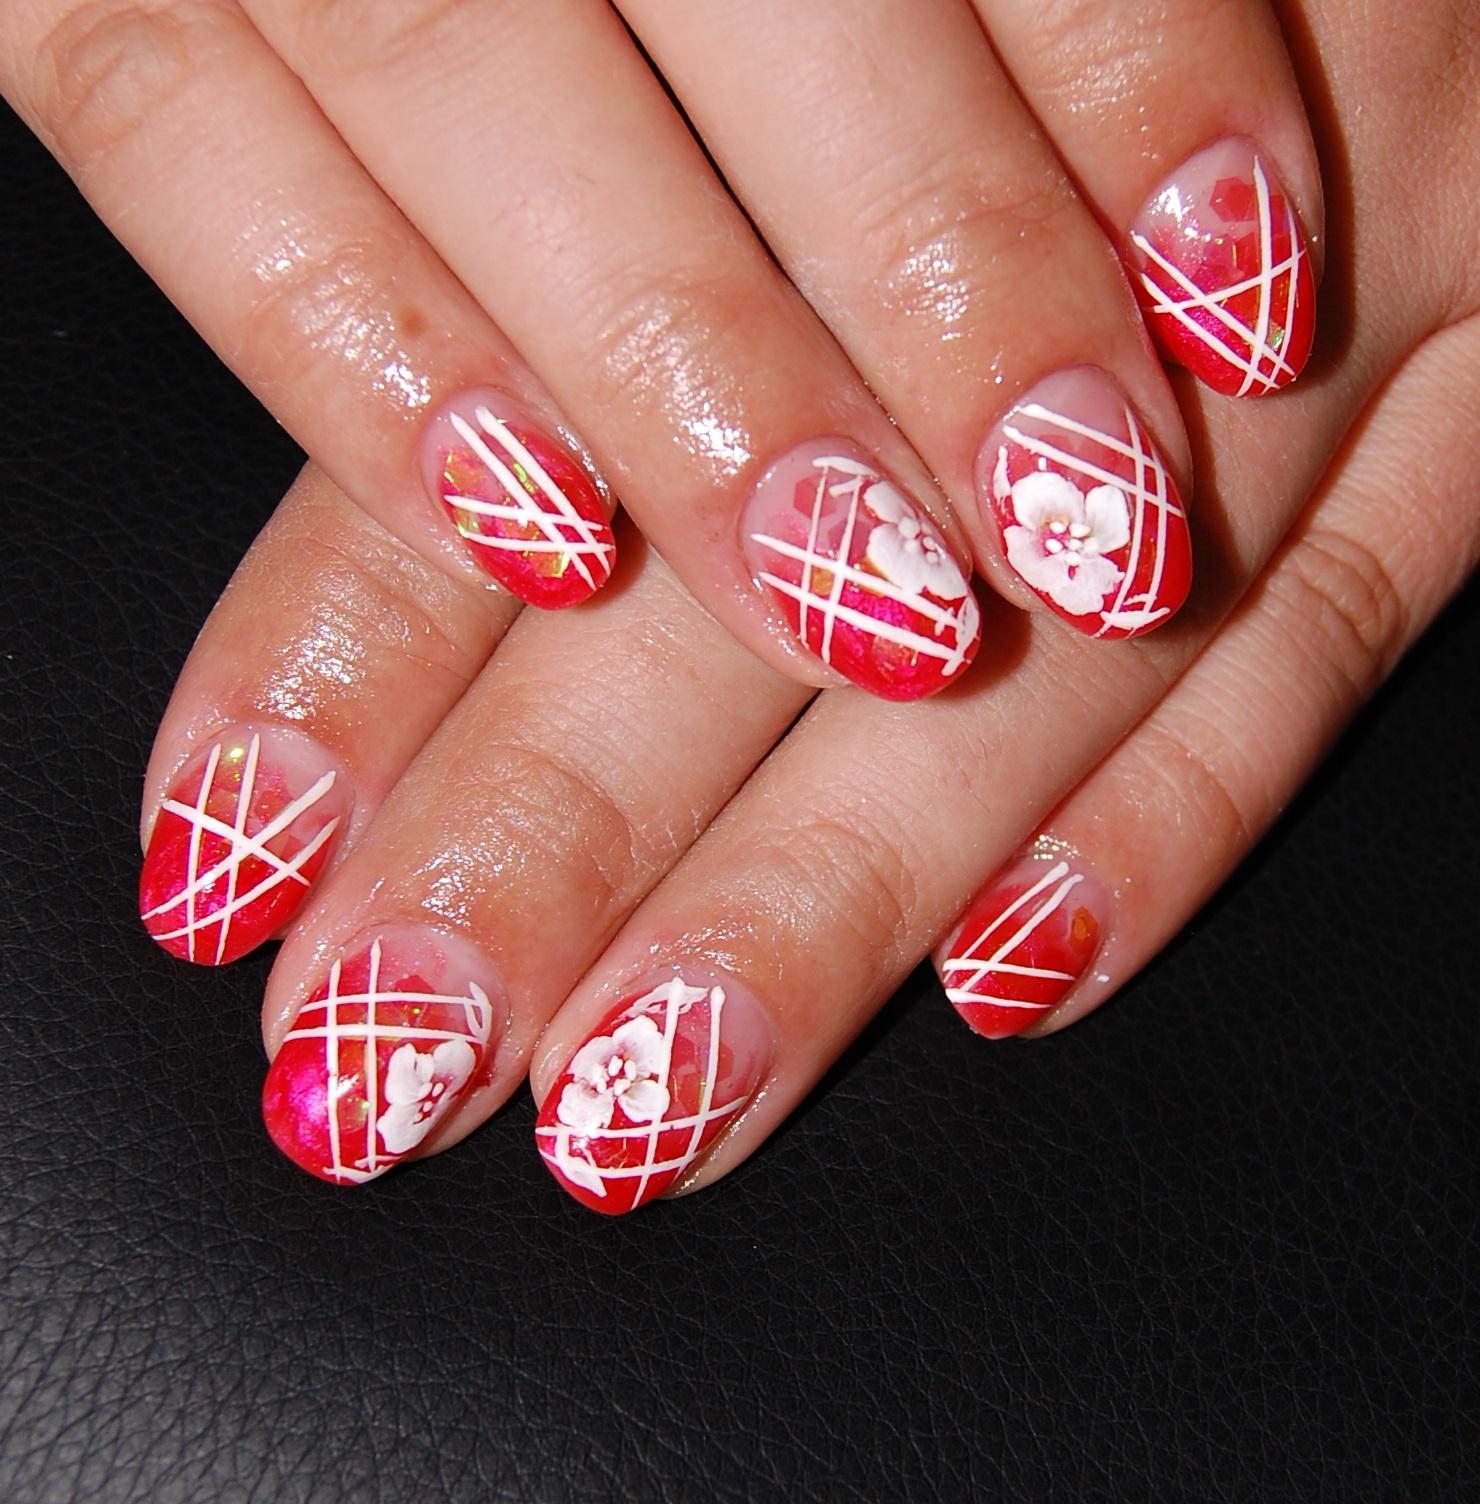 Bright red nails - The Best Images | BestArtNails.com